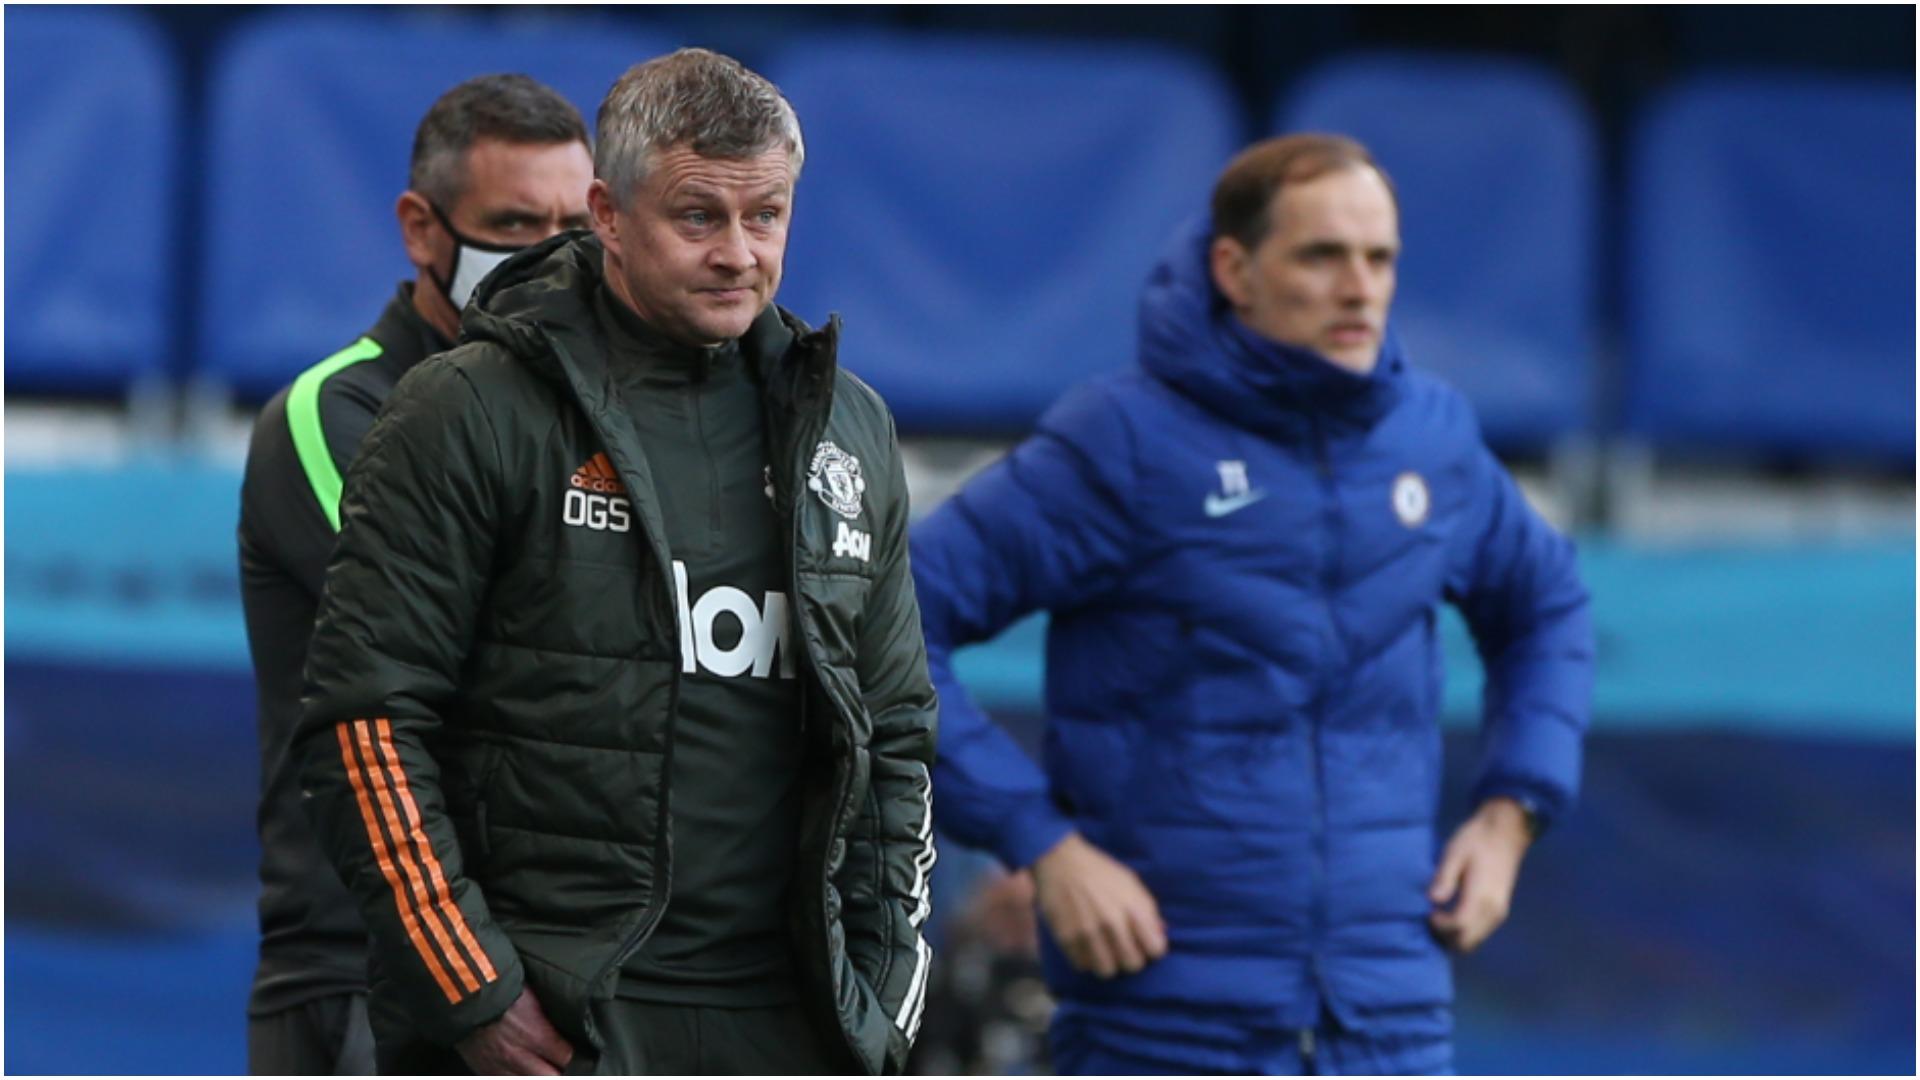 Premier League data dive: Man Utd's 'big six' struggles continue, Liverpool return to winning ways